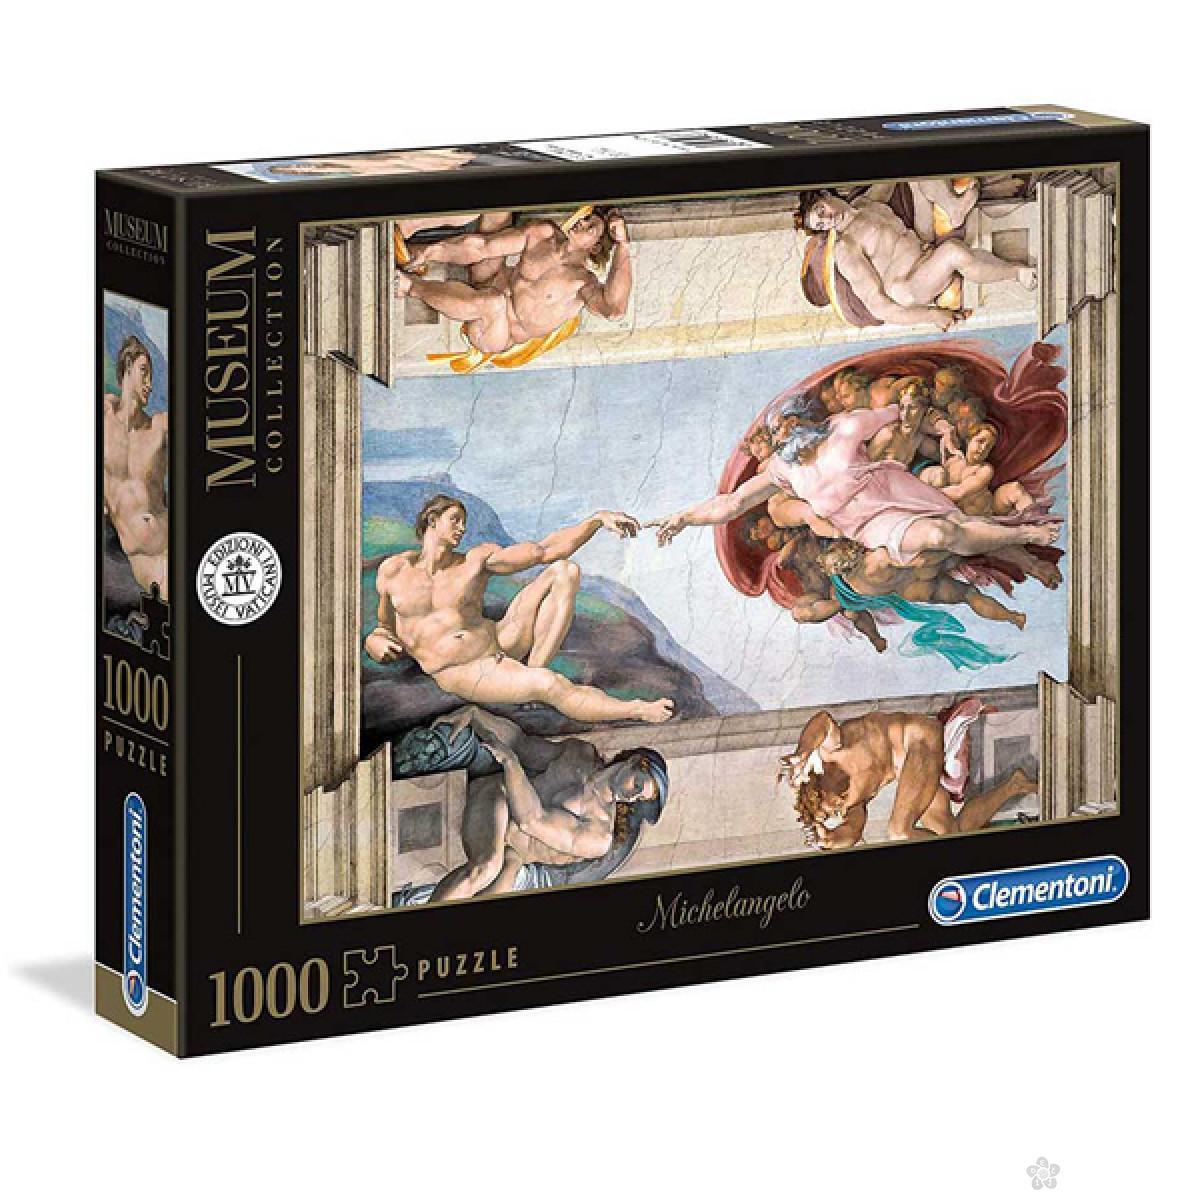 Puzzla Michelangelo The Creation of Man 1000 delova Clementoni, 39496